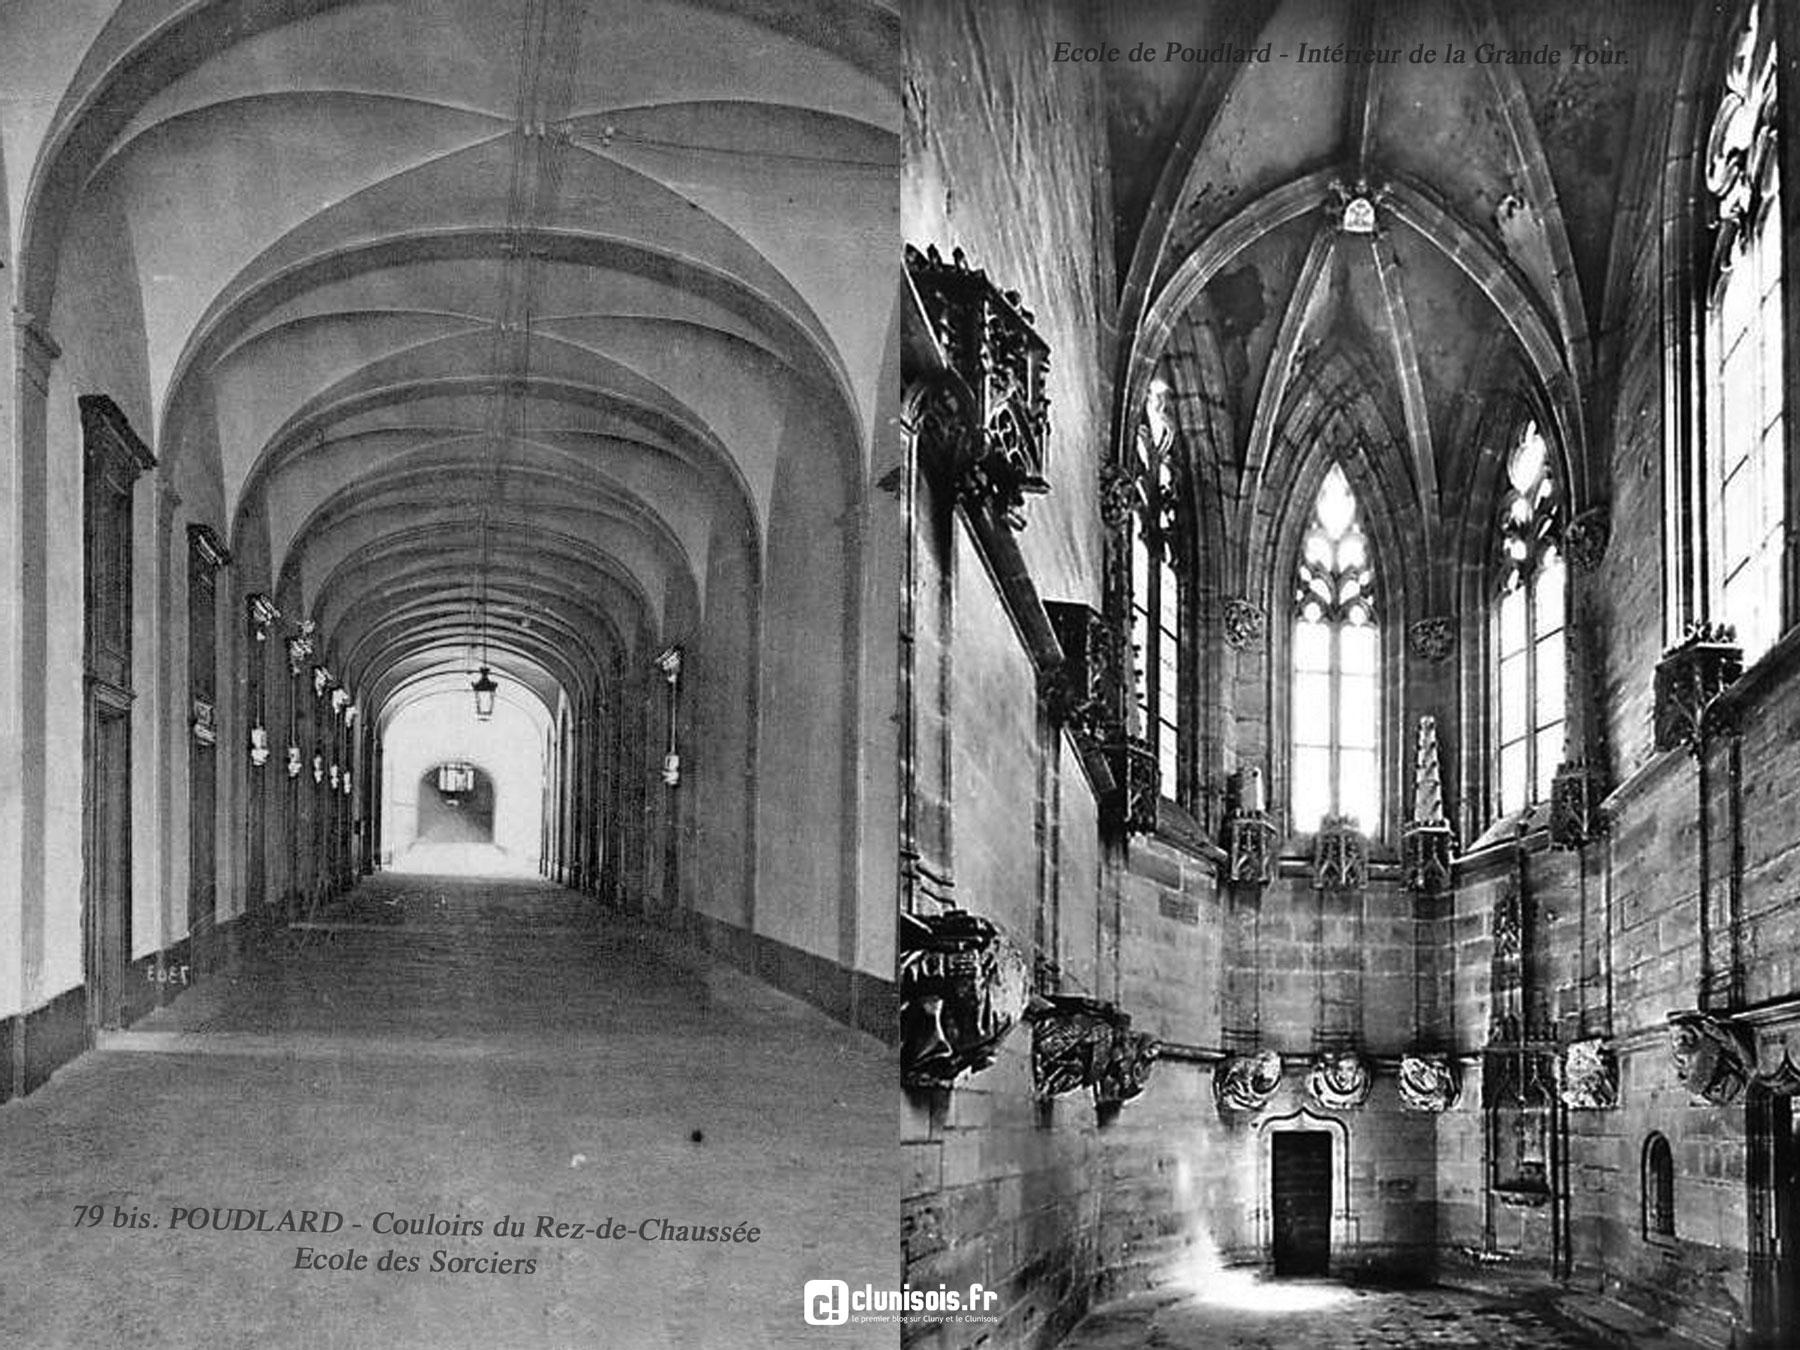 08-poudlard-existe-couloirs-tour-clunisoisfr